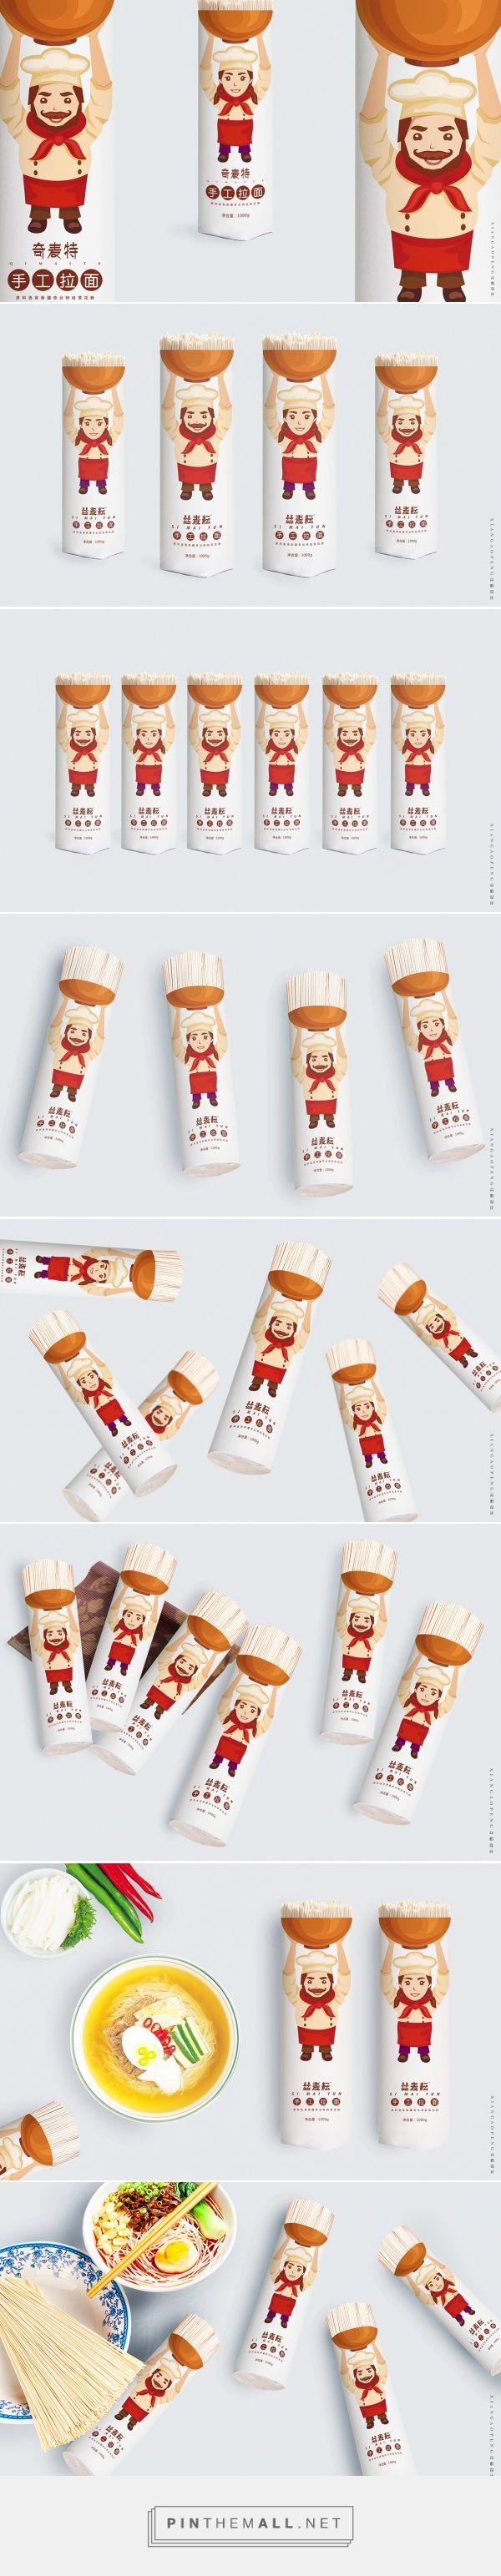 SIMAIYUN Noodles packaging design by Xian Gao Peng - http://www.packagingoftheworld.com/2017/09/simaiyun-noodles.html